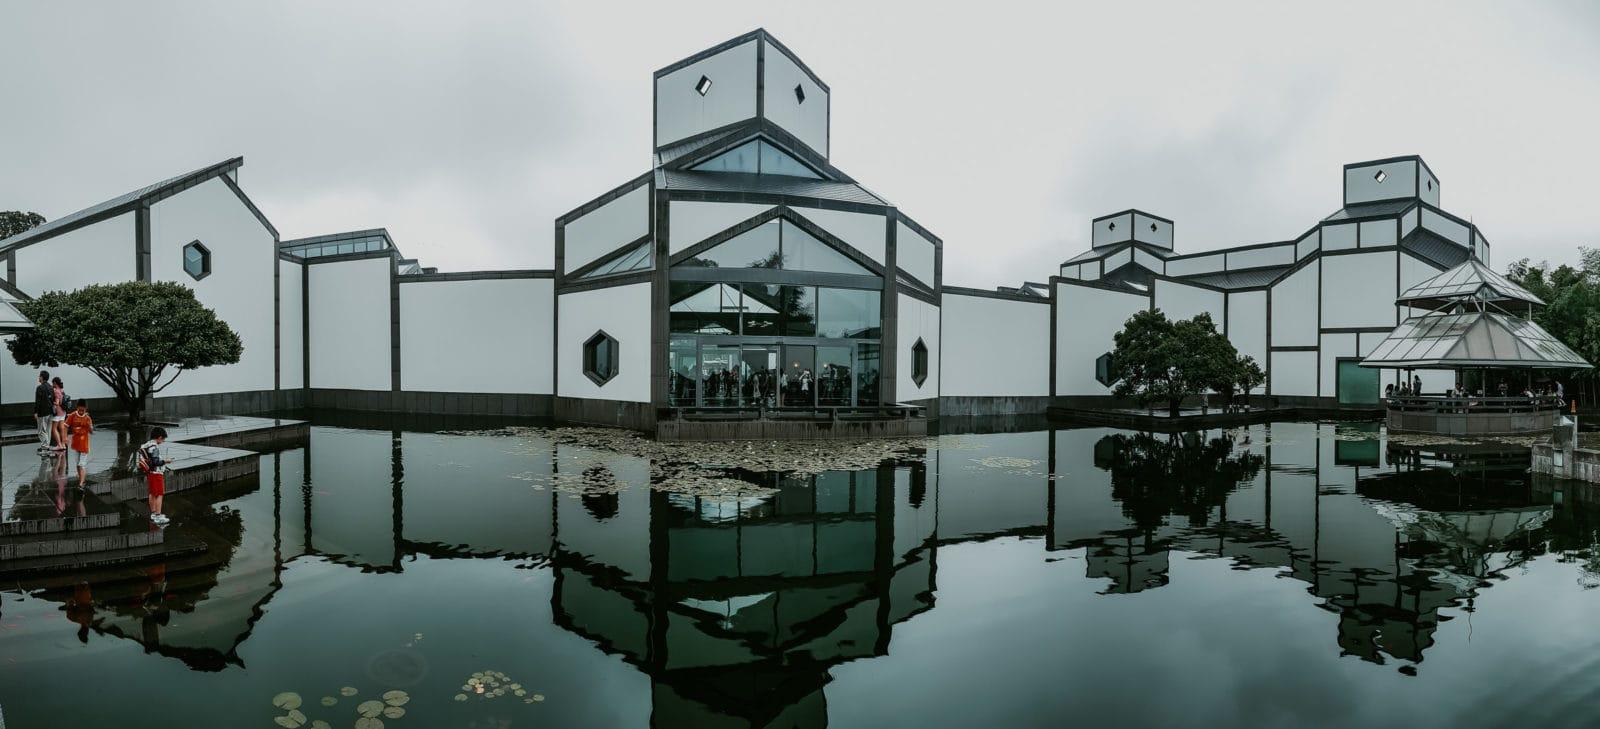 Suzhou Sehenswürdigkeiten Suzhou Museum Ieoh Ming Pei